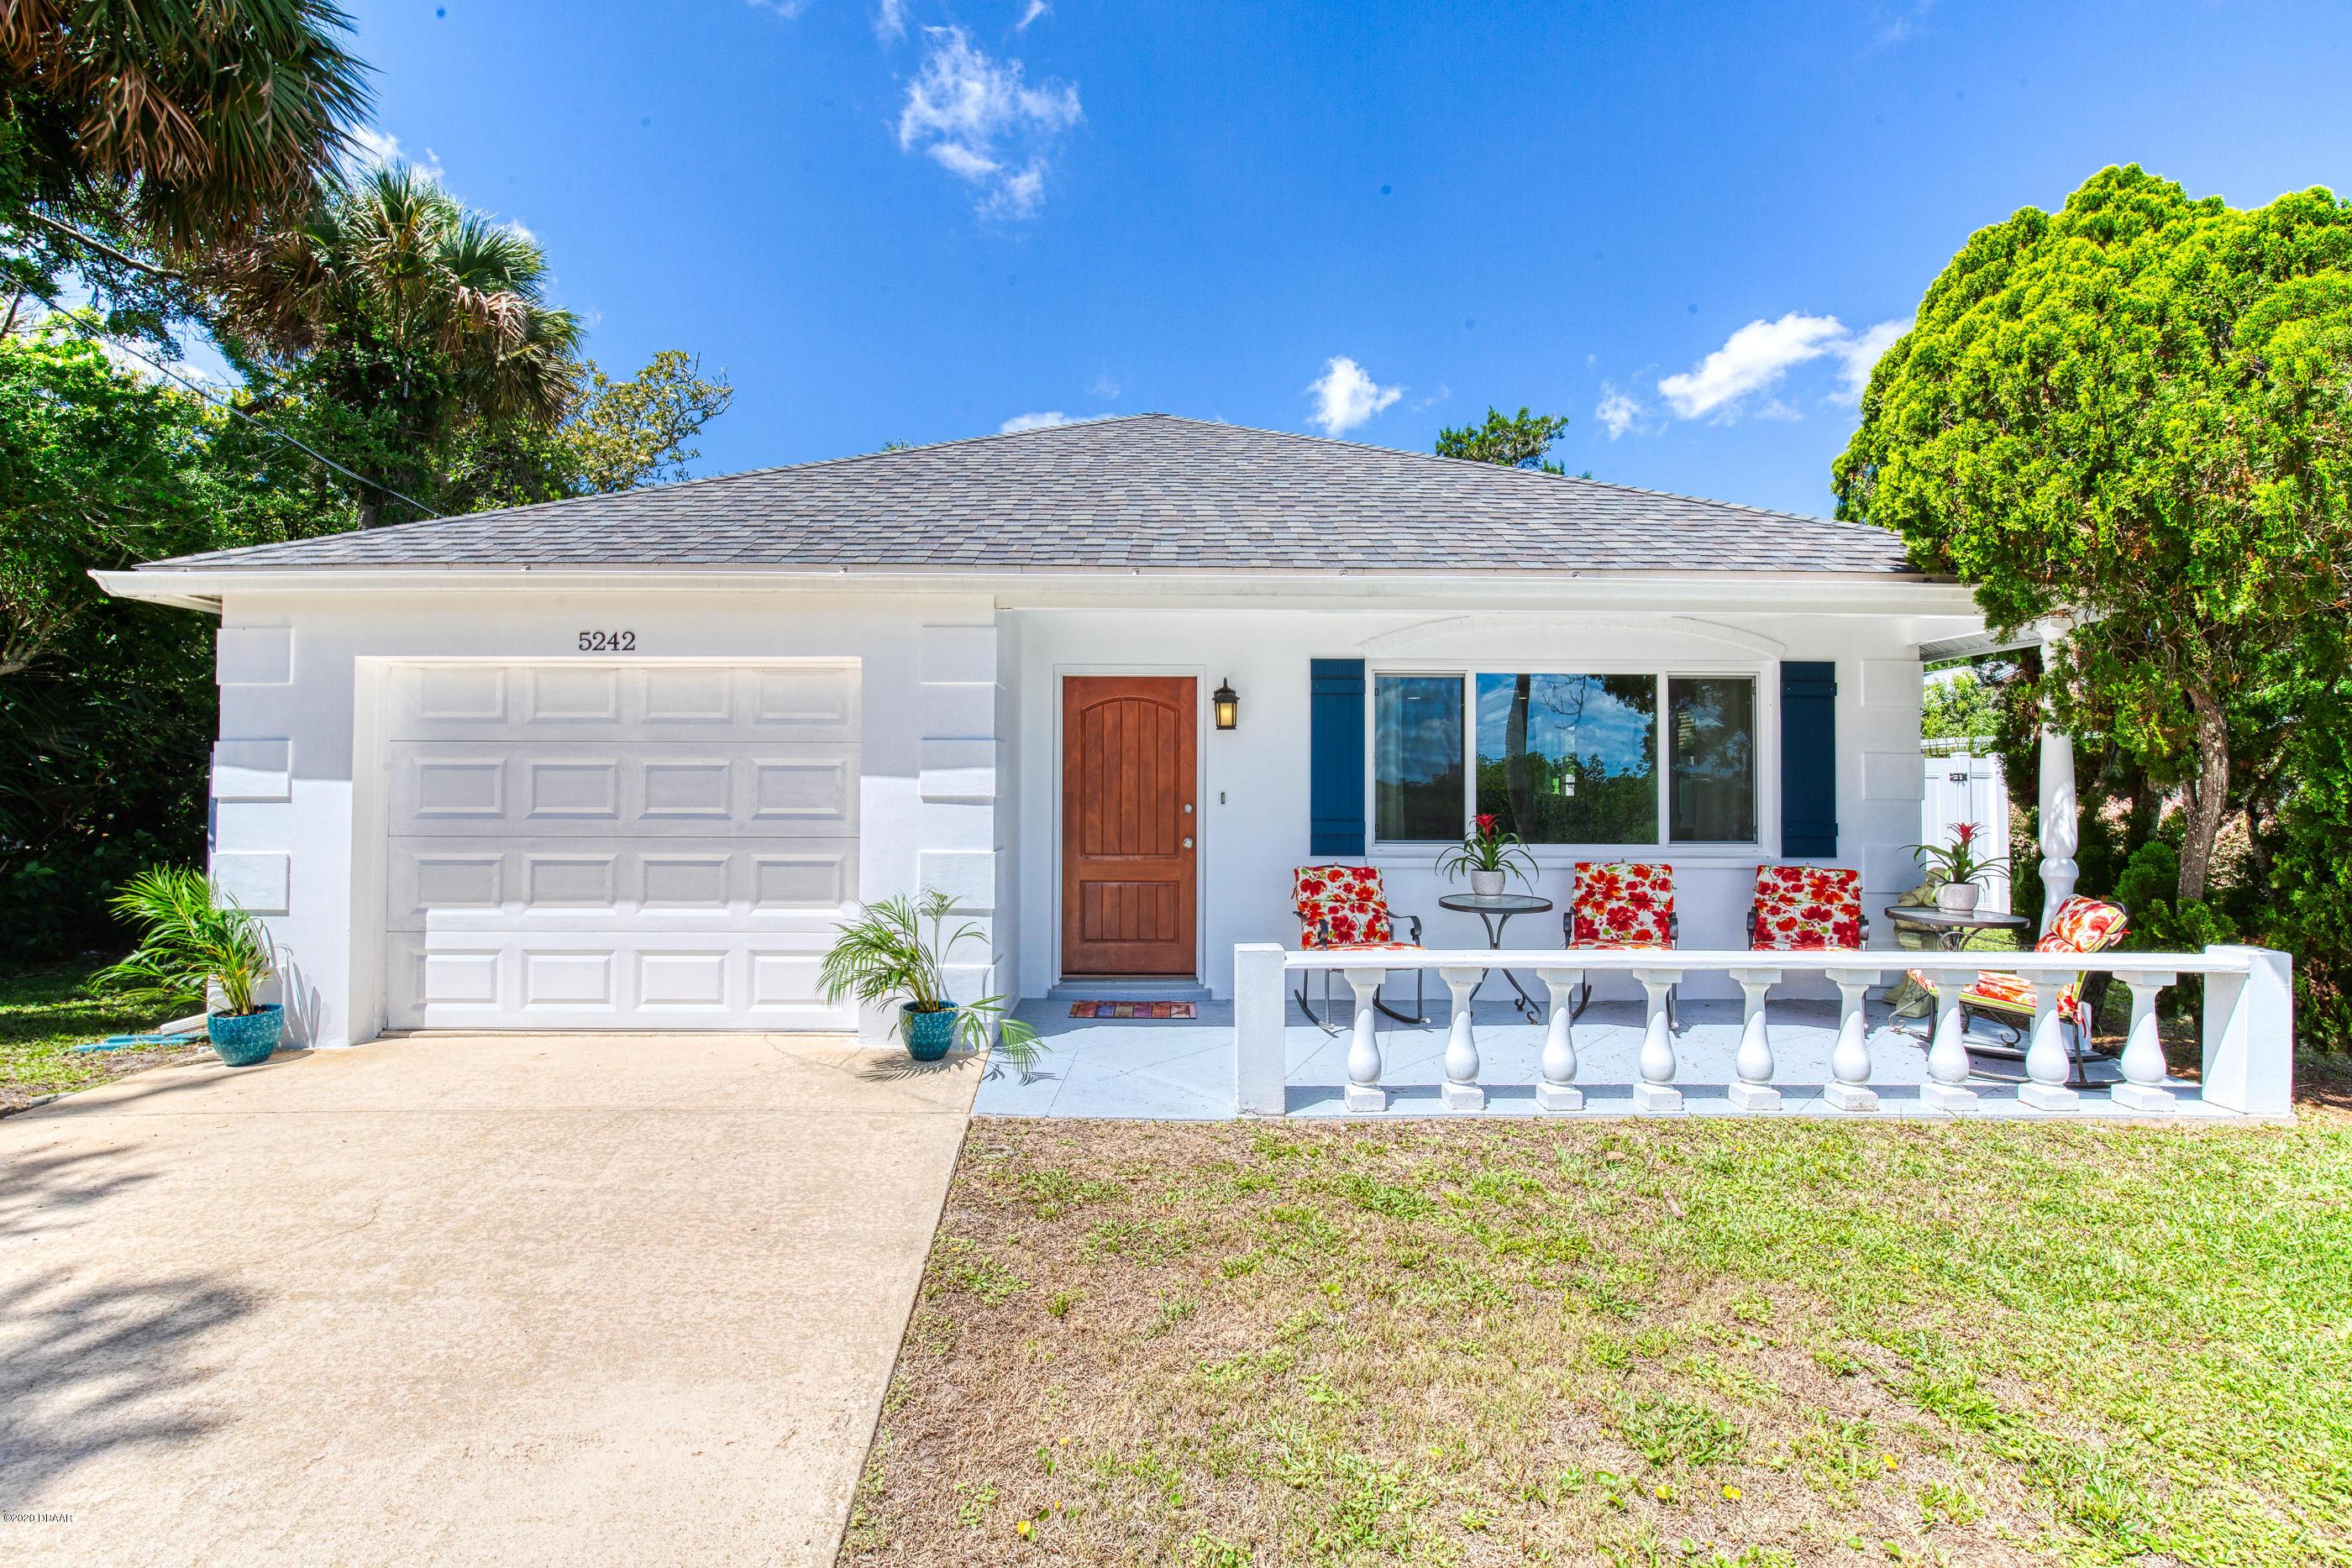 Photo of 5242 Riverside Drive, Port Orange, FL 32127